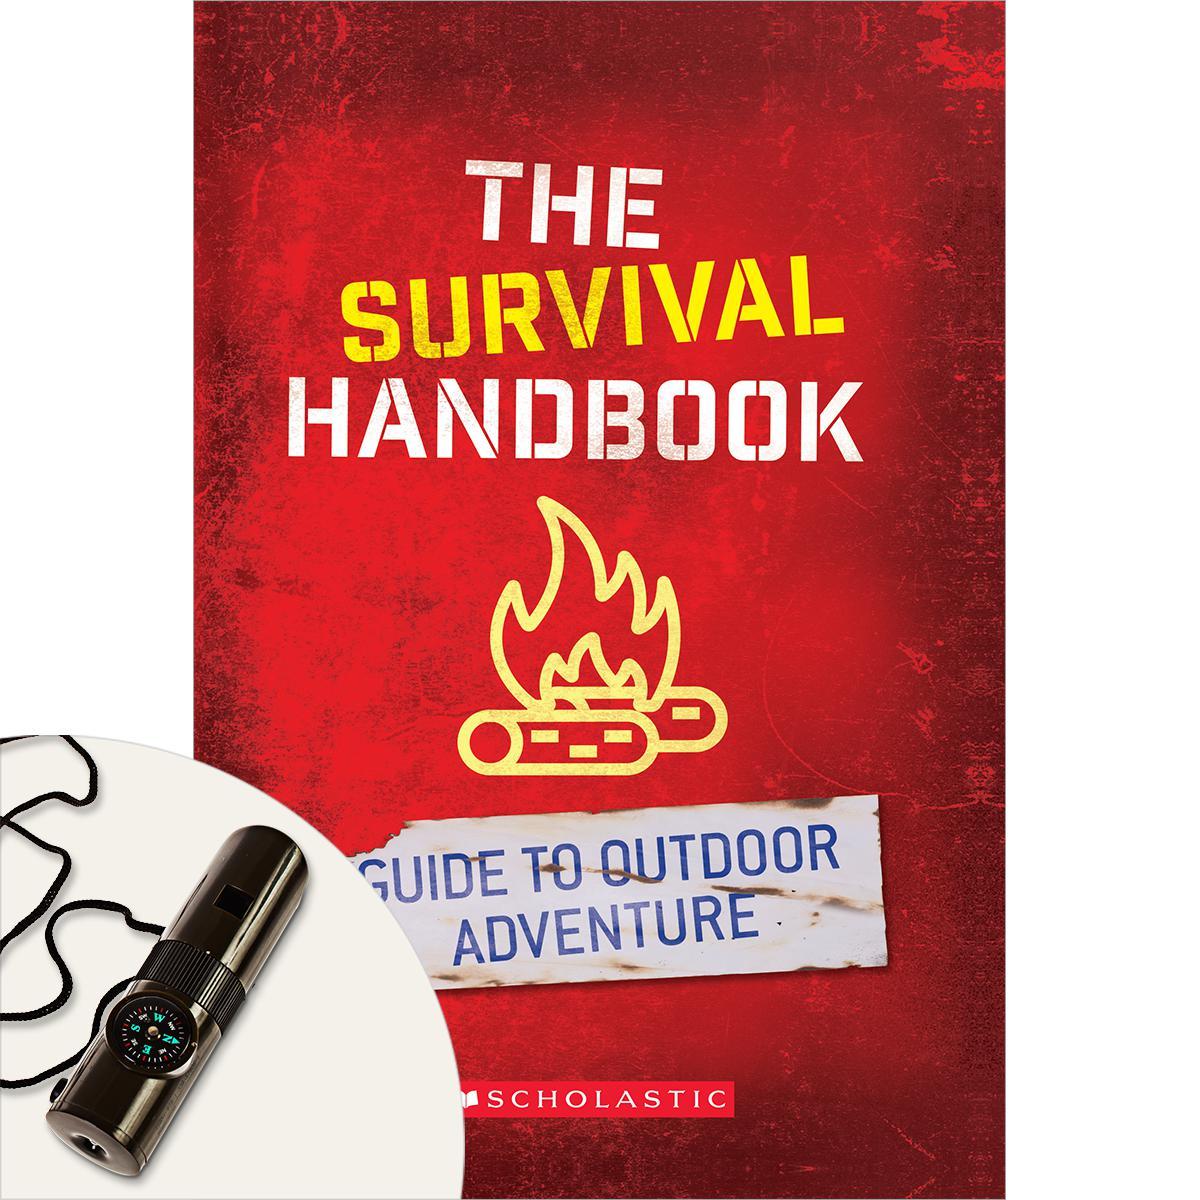 The Survival Handbook Pack